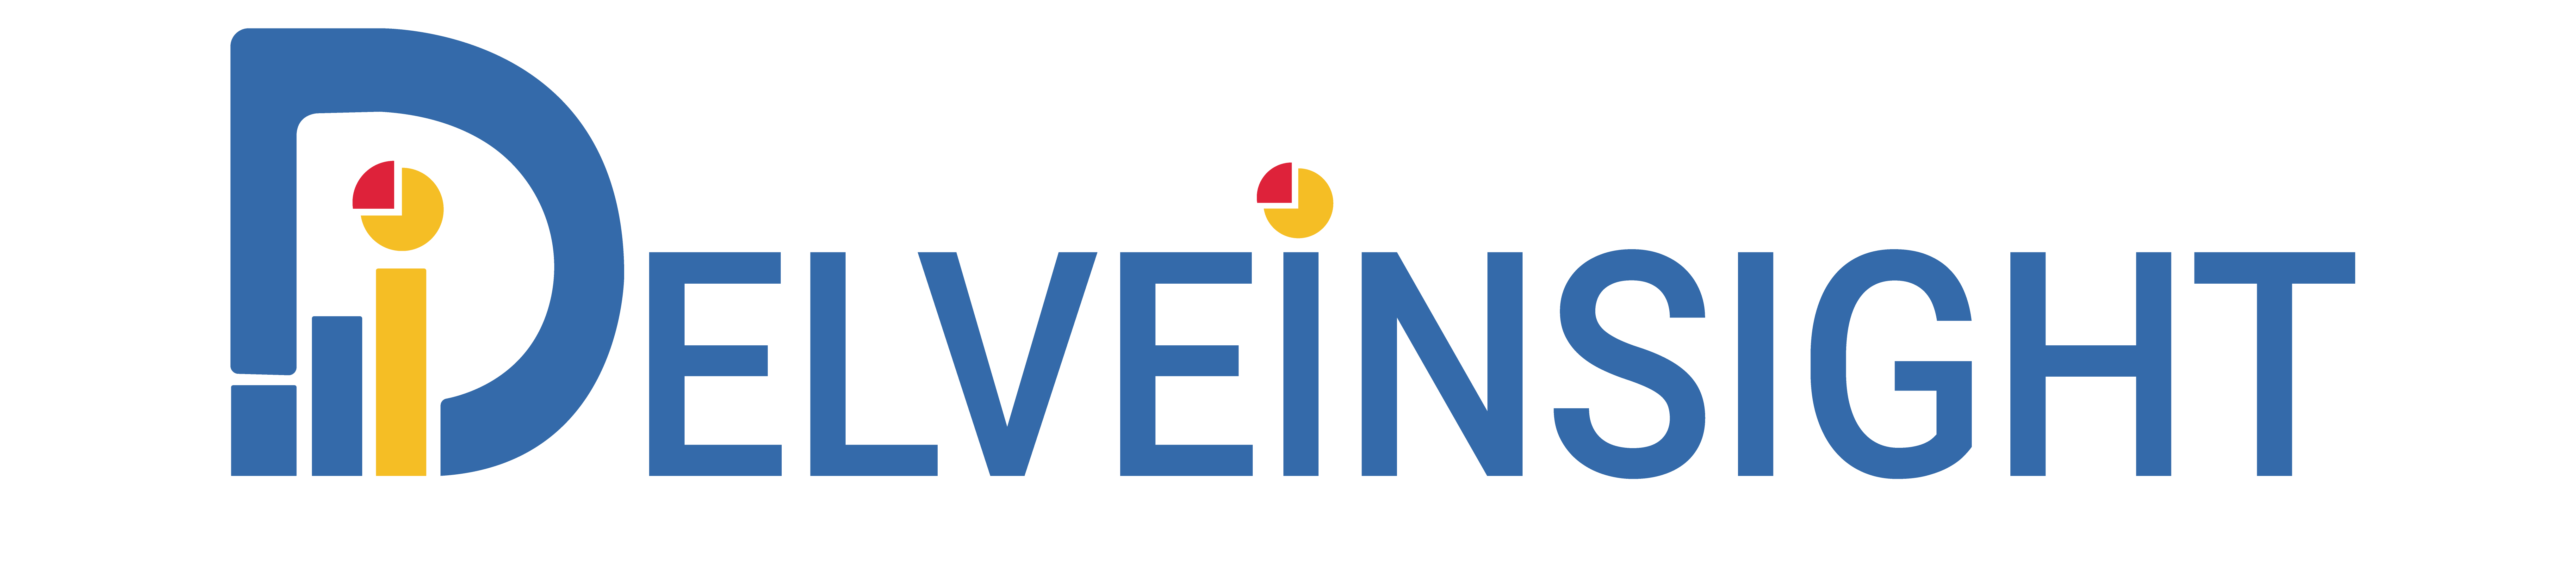 Tendinitis Pipeline: Emerging Therapies and Key pharma players involved by DelveInsight | Seikagaku Corporation, MetrioPharm, MiMedx, Zhejiang Xingyue Biotechnology Co., Ltd., R3 Stem Cell, Dobecure